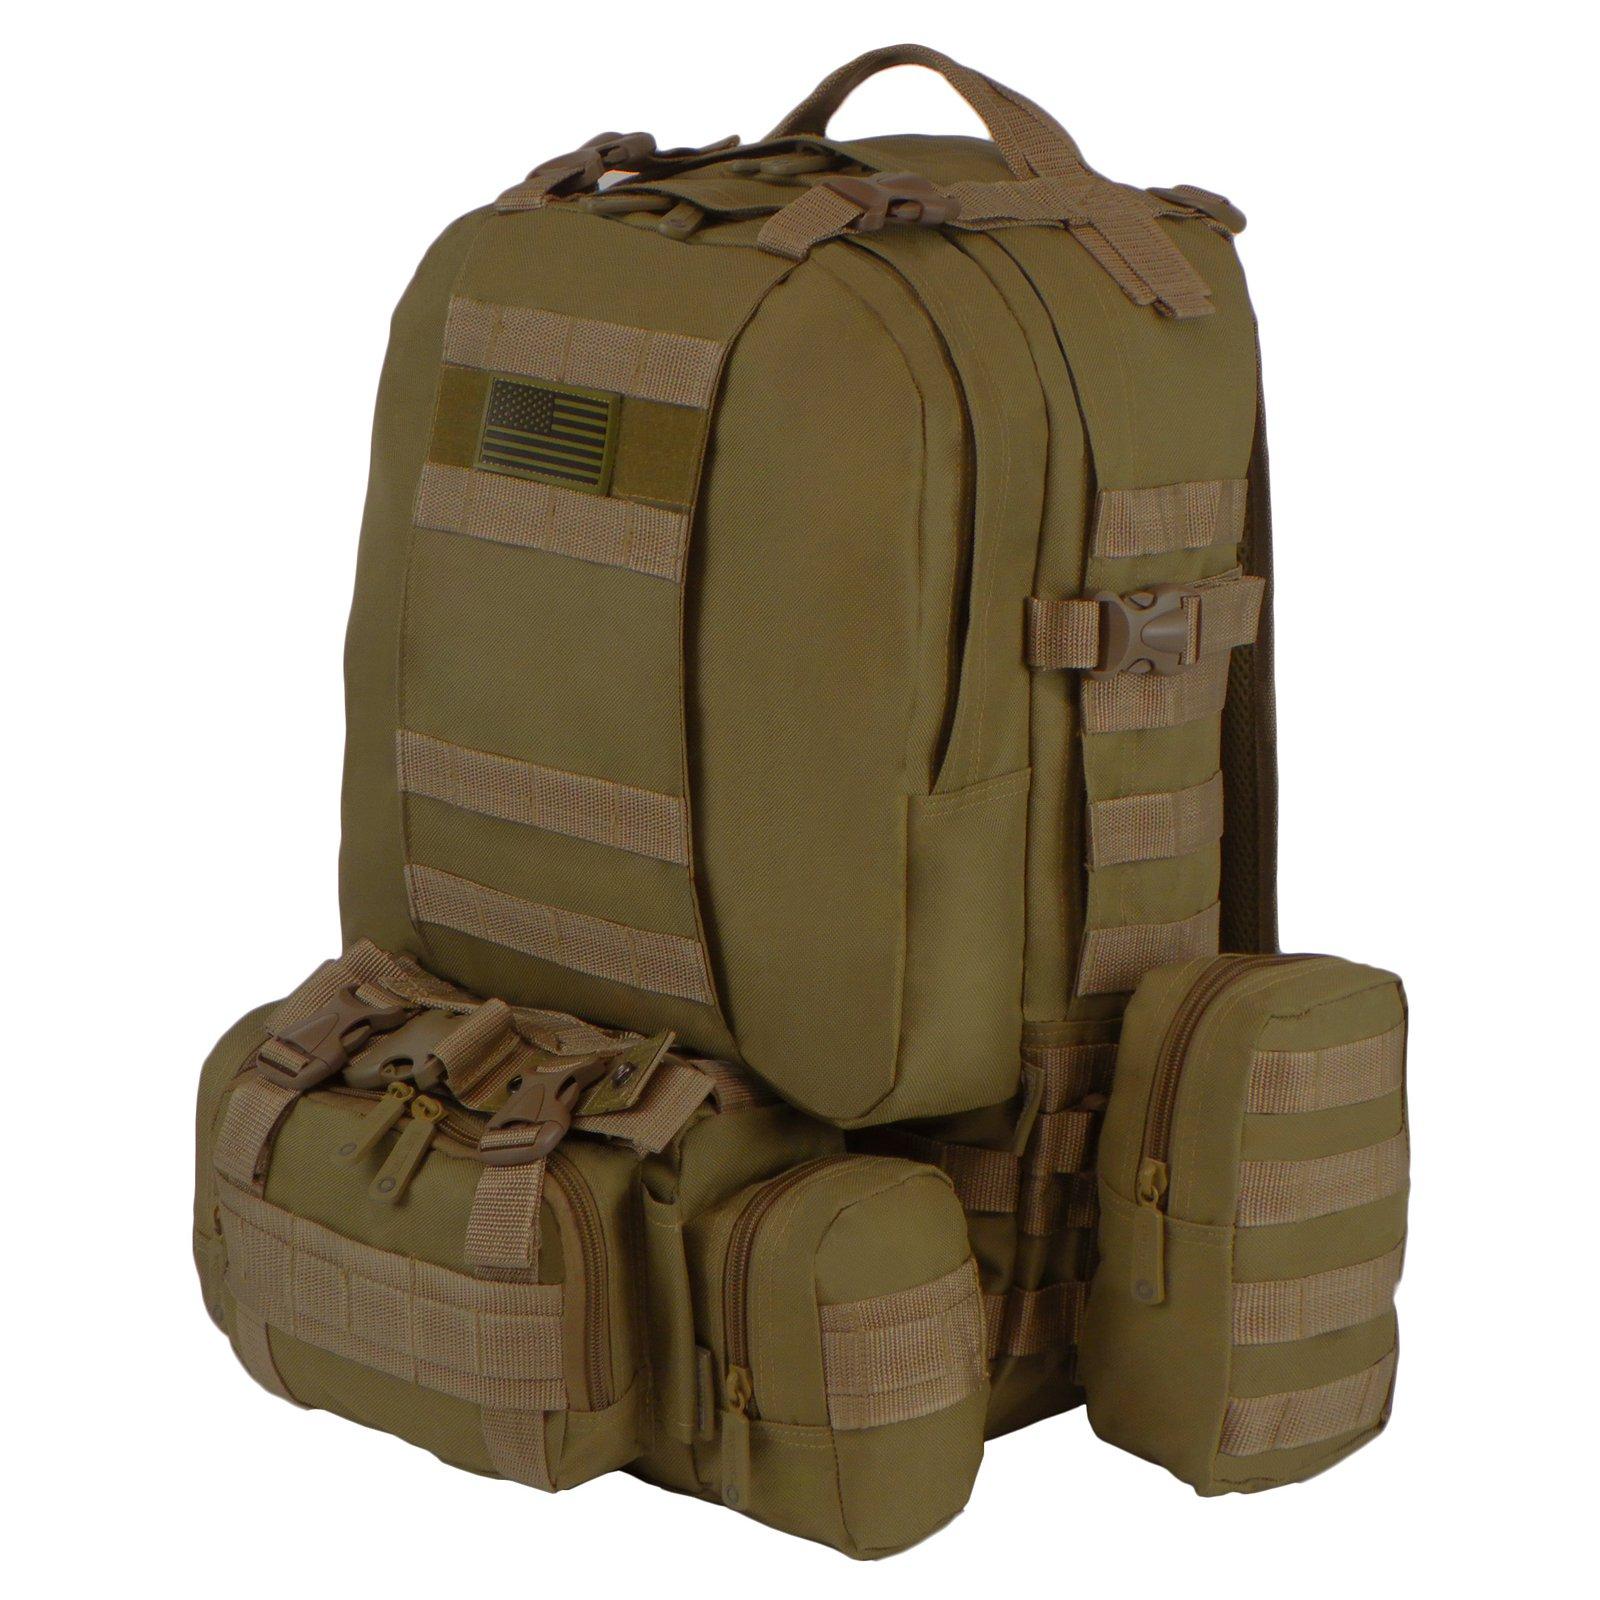 East West U.S.A. Tactical Molle Military Rucksack Trekkin...